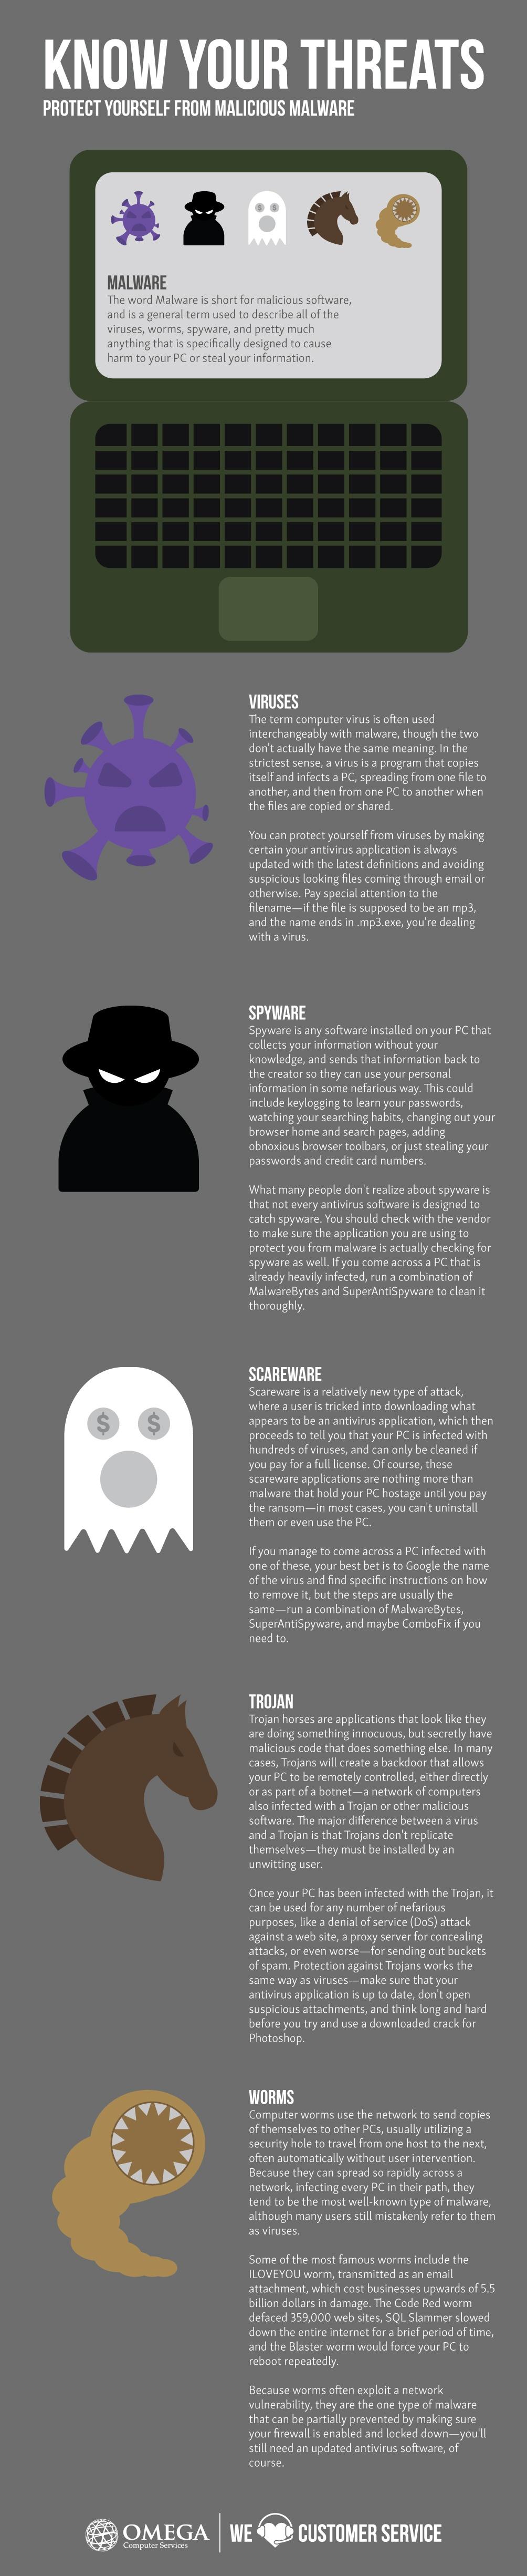 cybersecurity, cyber threat, cyber crime, malware, spyware, shareware, viruses